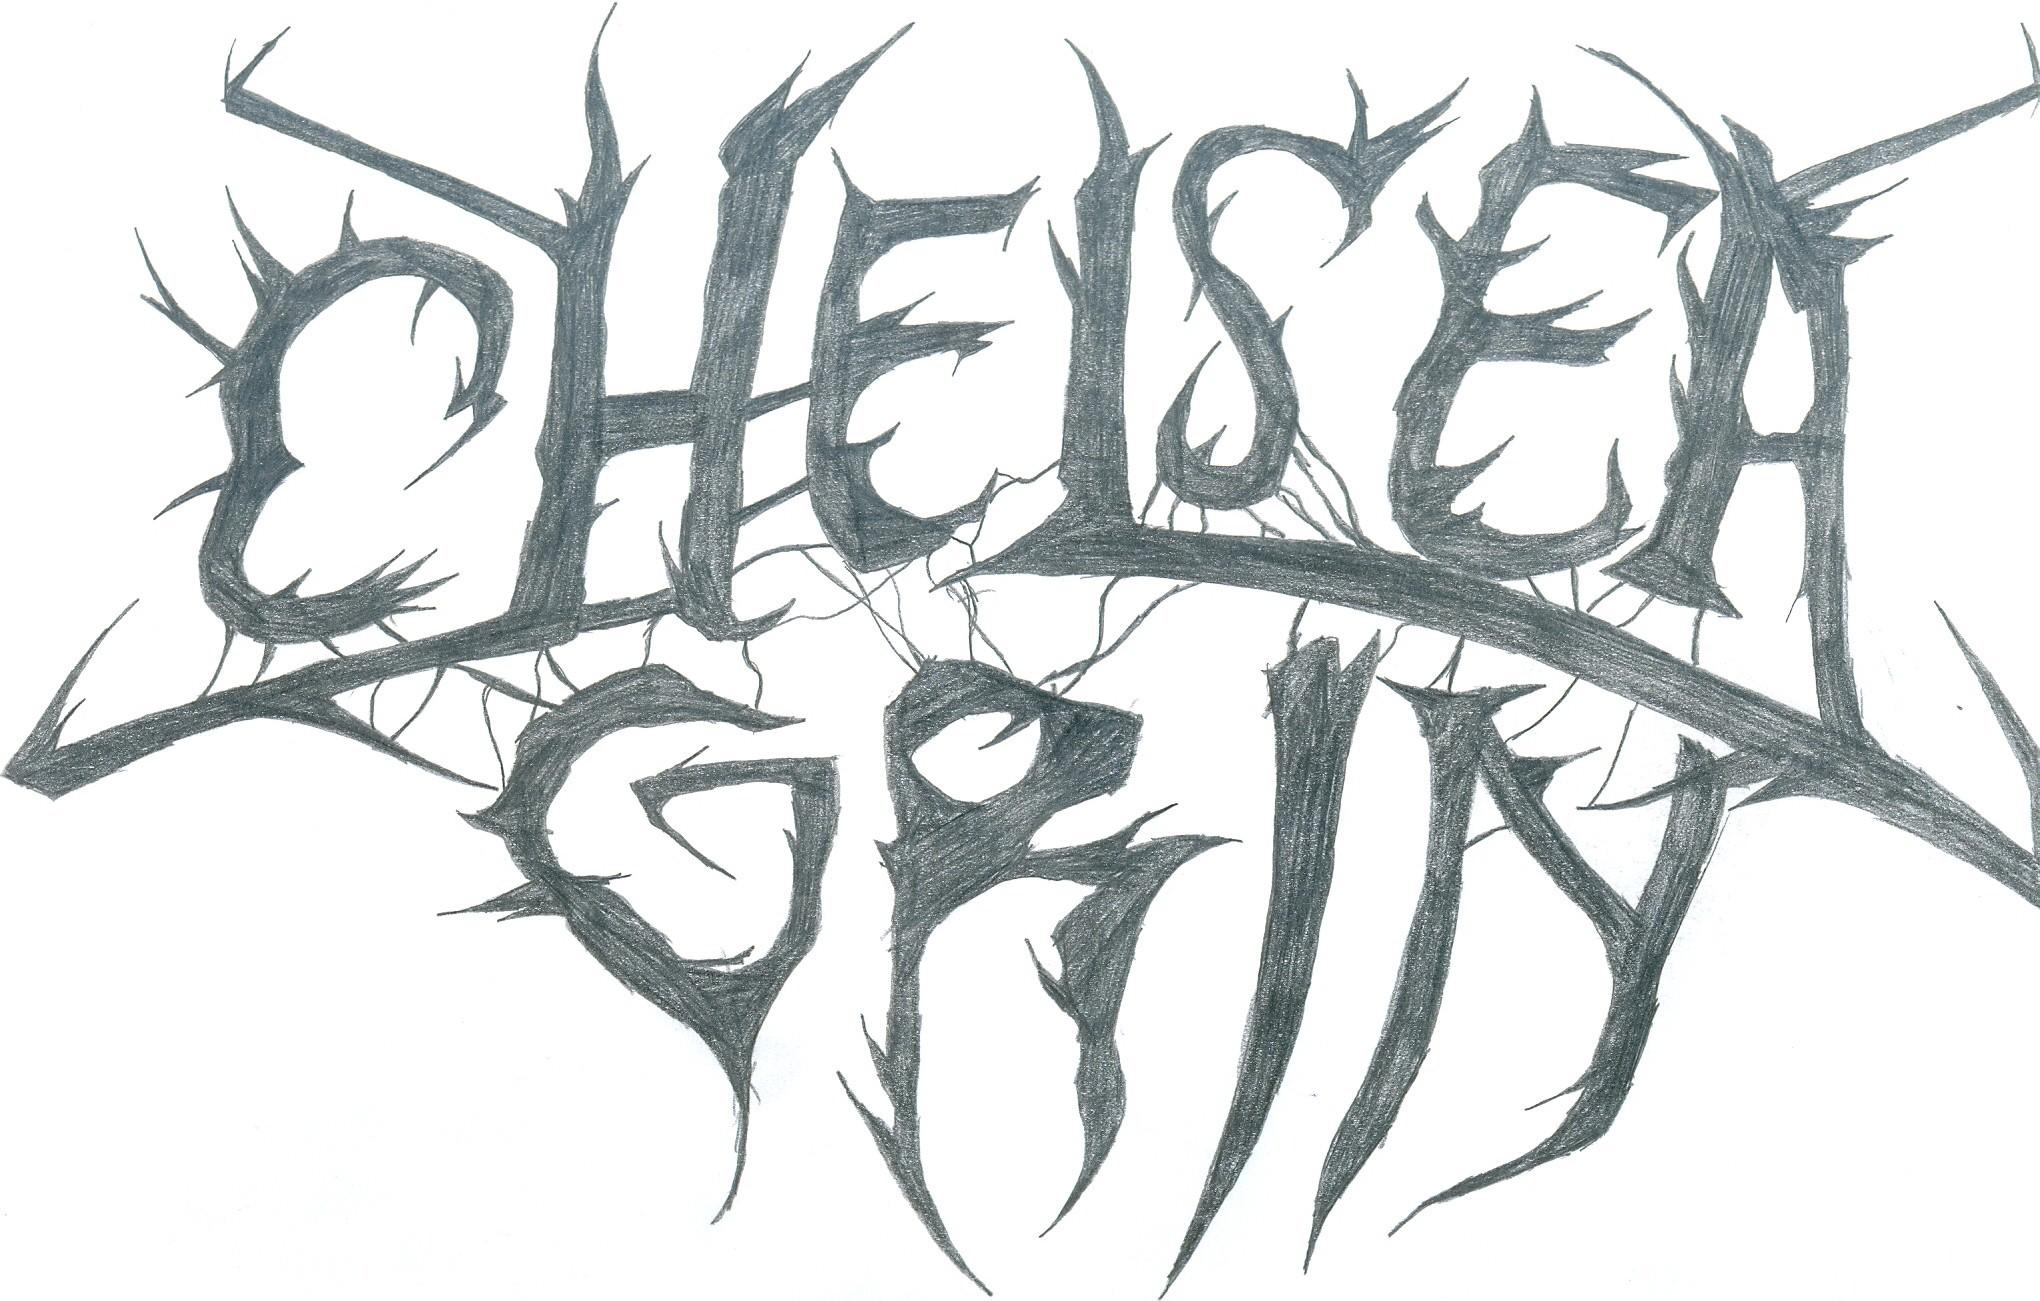 Chelsea Grin logo by Amazingtableheadman Chelsea Grin logo by  Amazingtableheadman